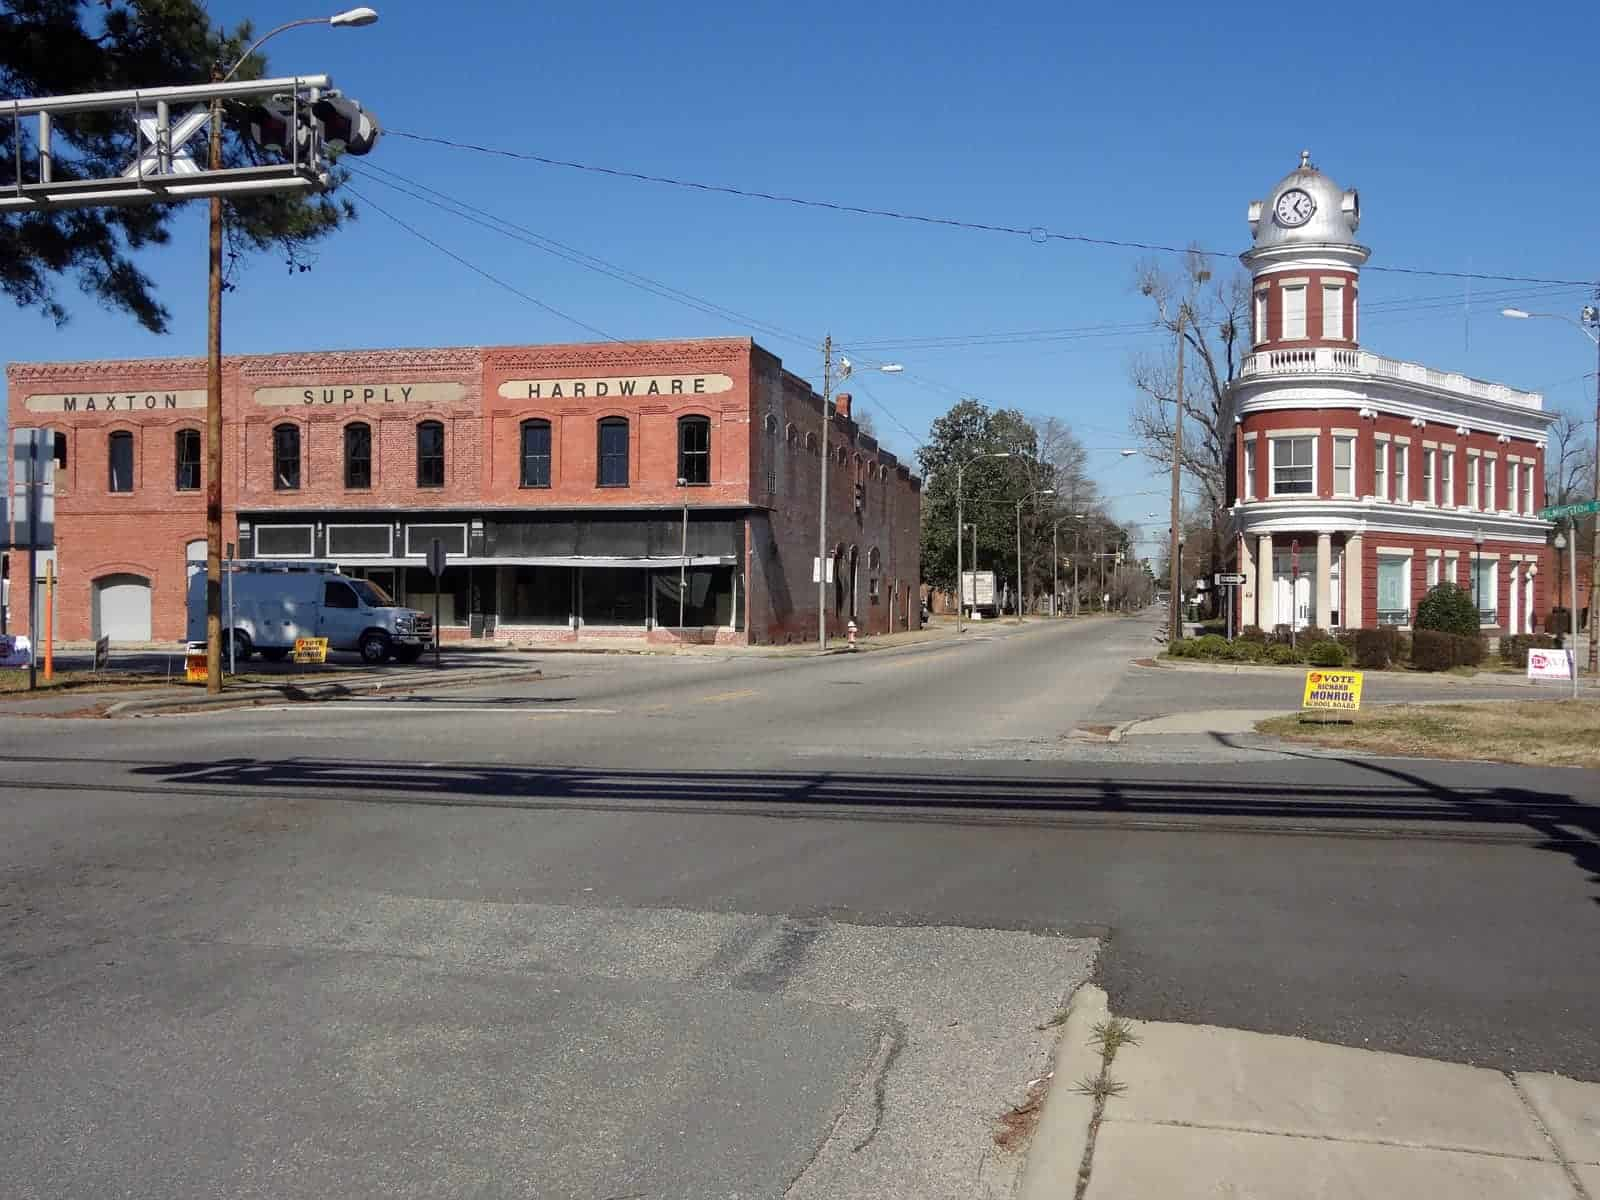 Downtown Maxton, North Carolina.